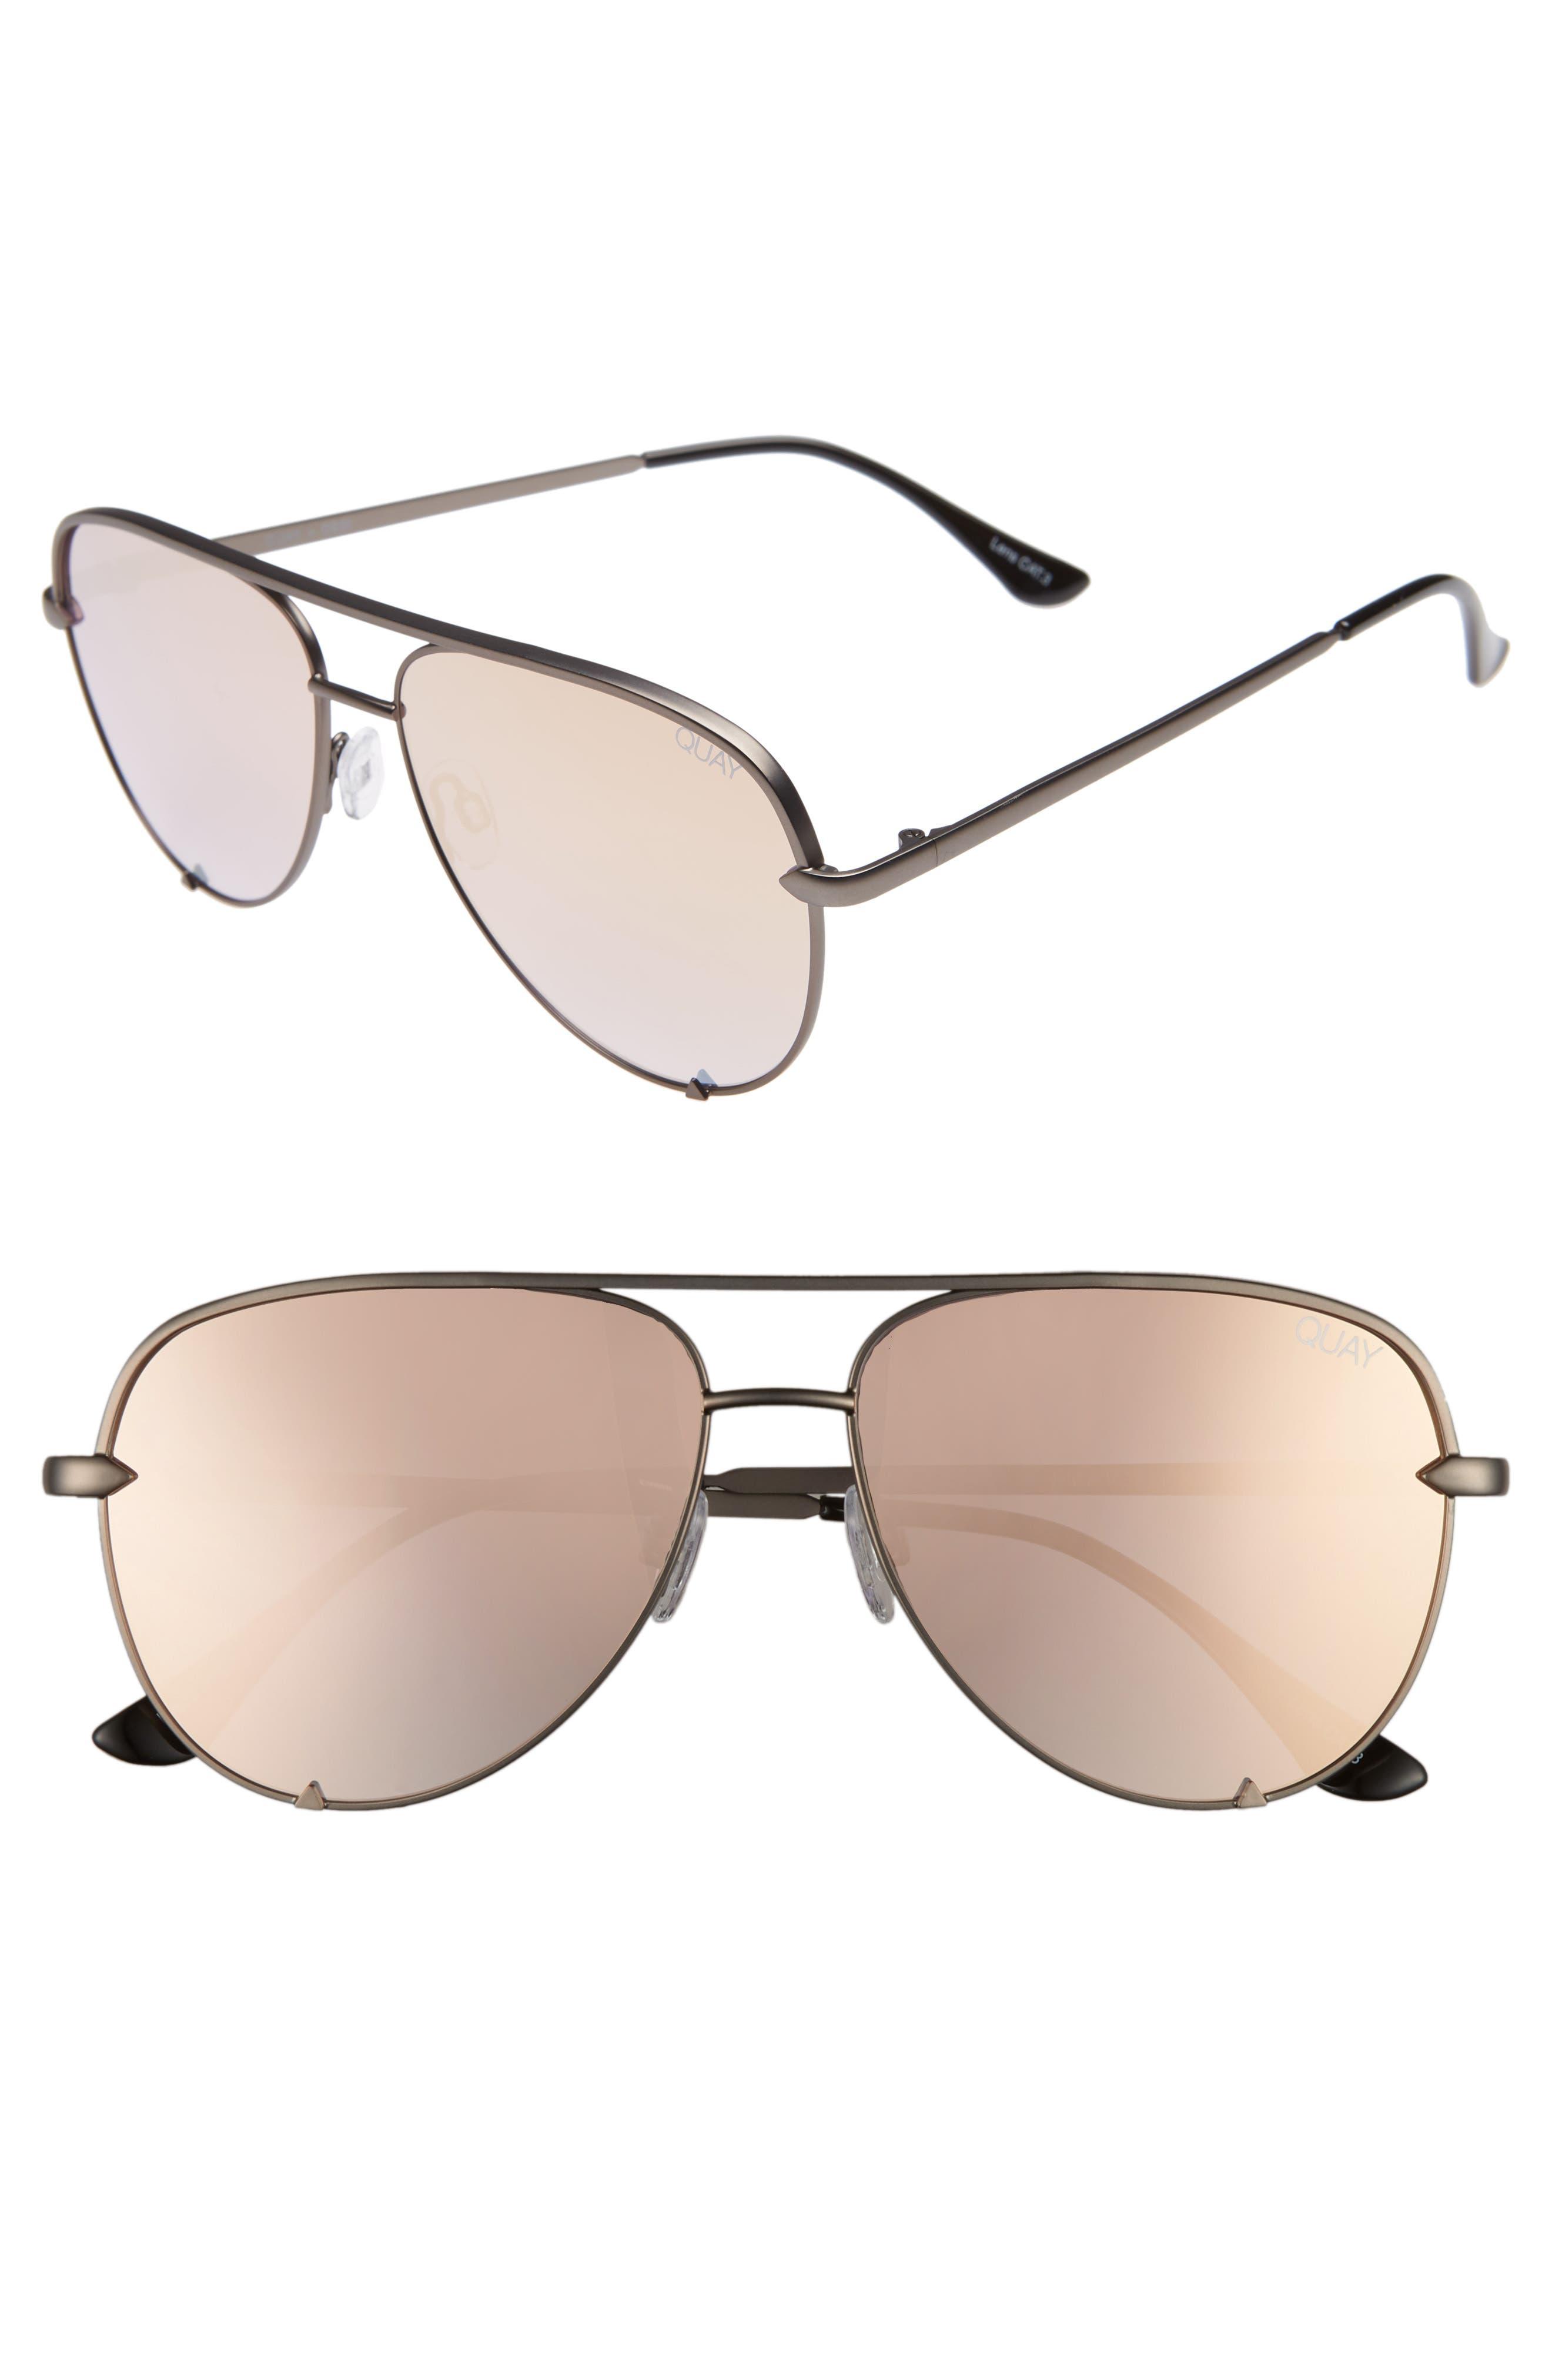 x Desi Perkins High Key Mini 57mm Aviator Sunglasses,                         Main,                         color, GUNMETAL/ ROSE